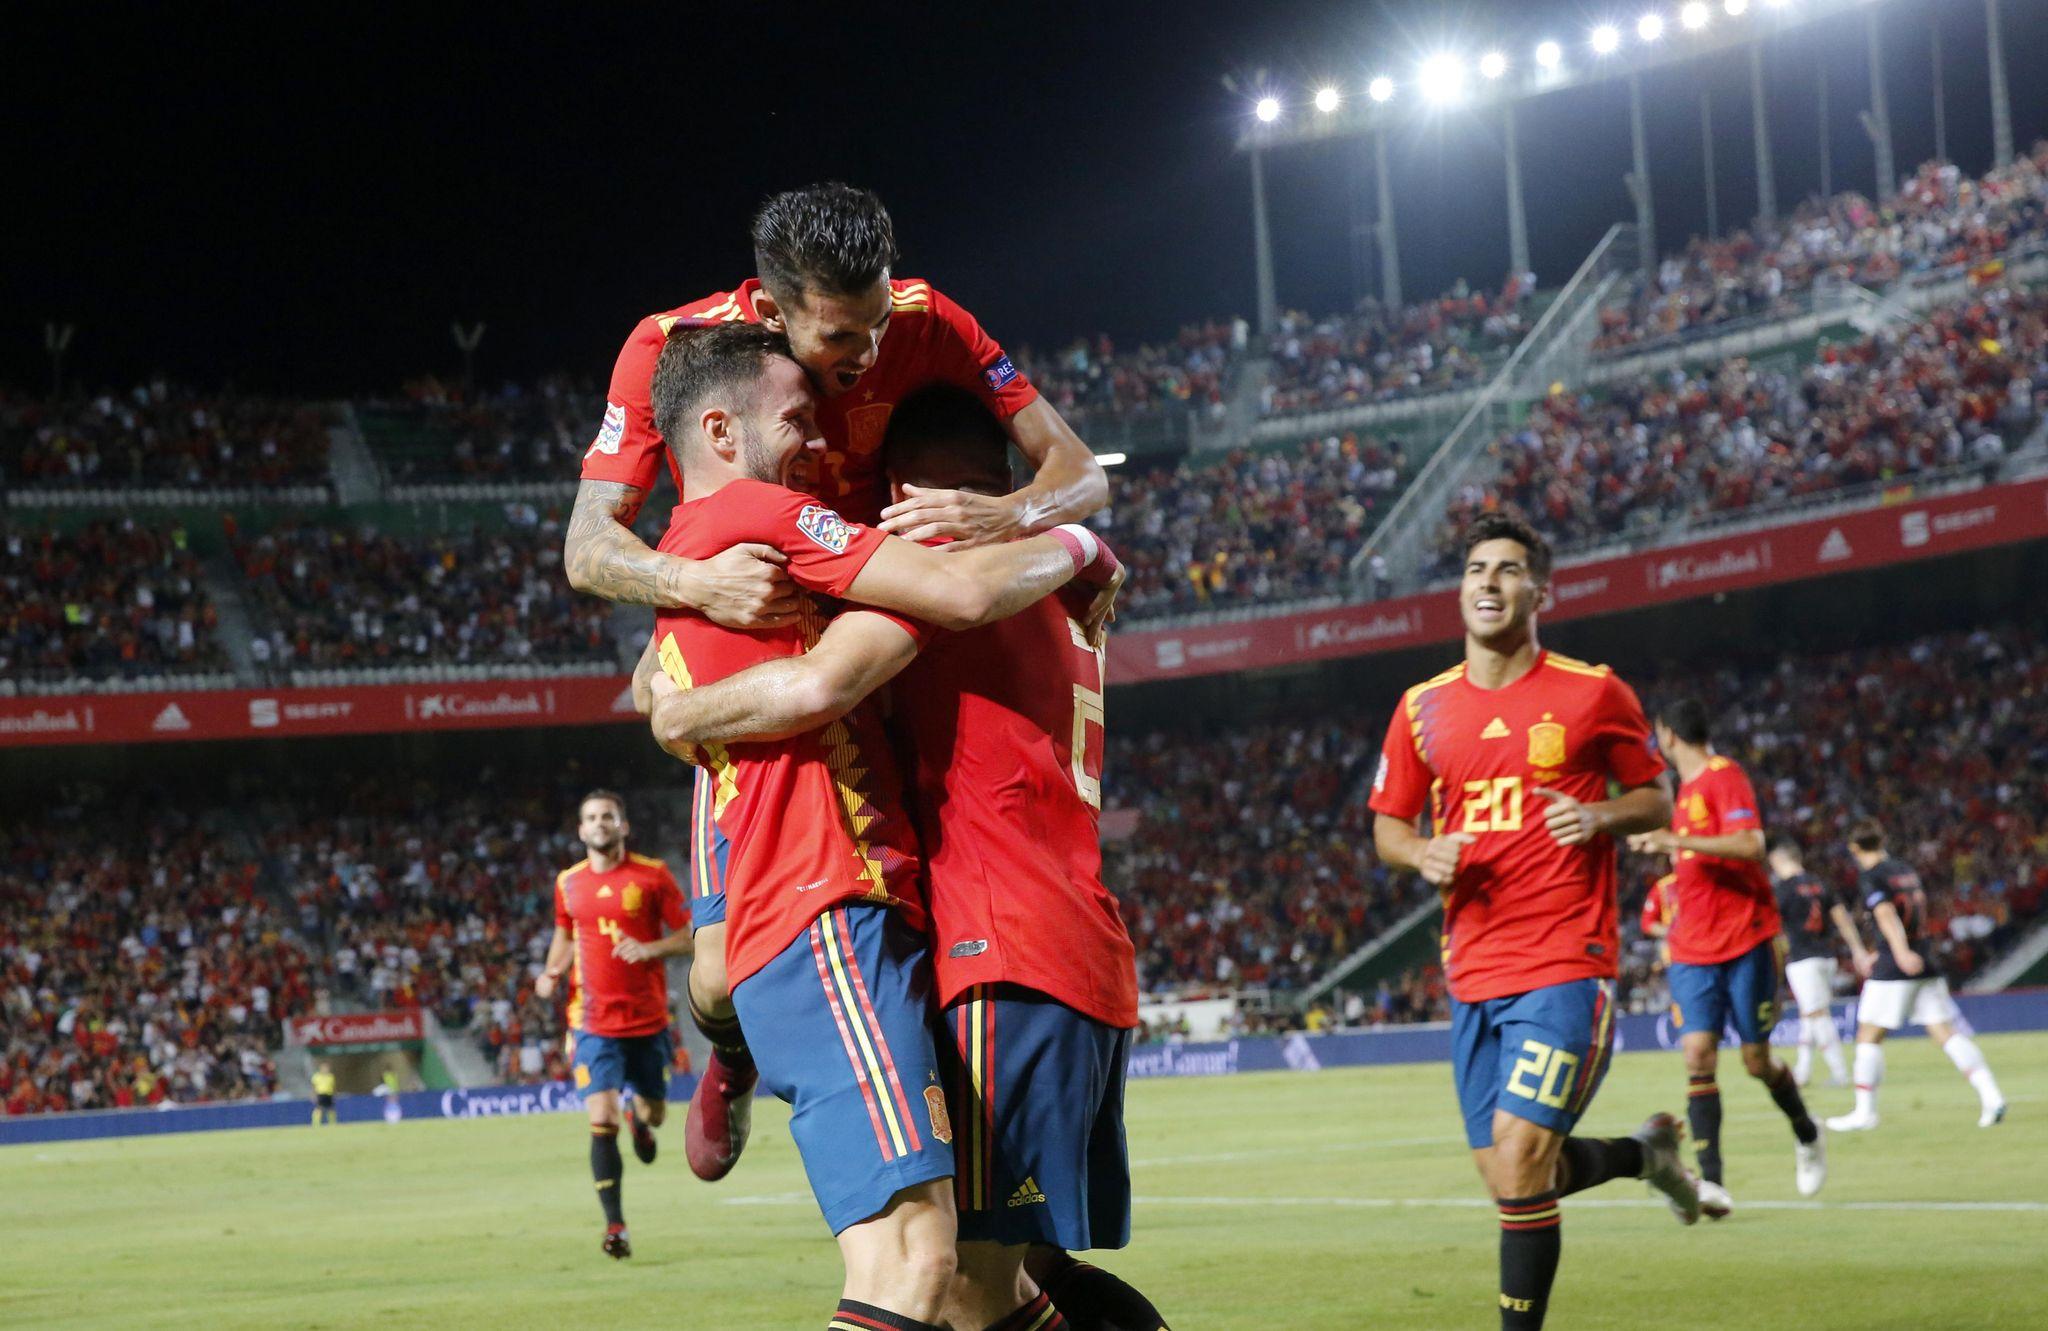 Spain_croatia_nations_league_soccer_73524_s2048x1331